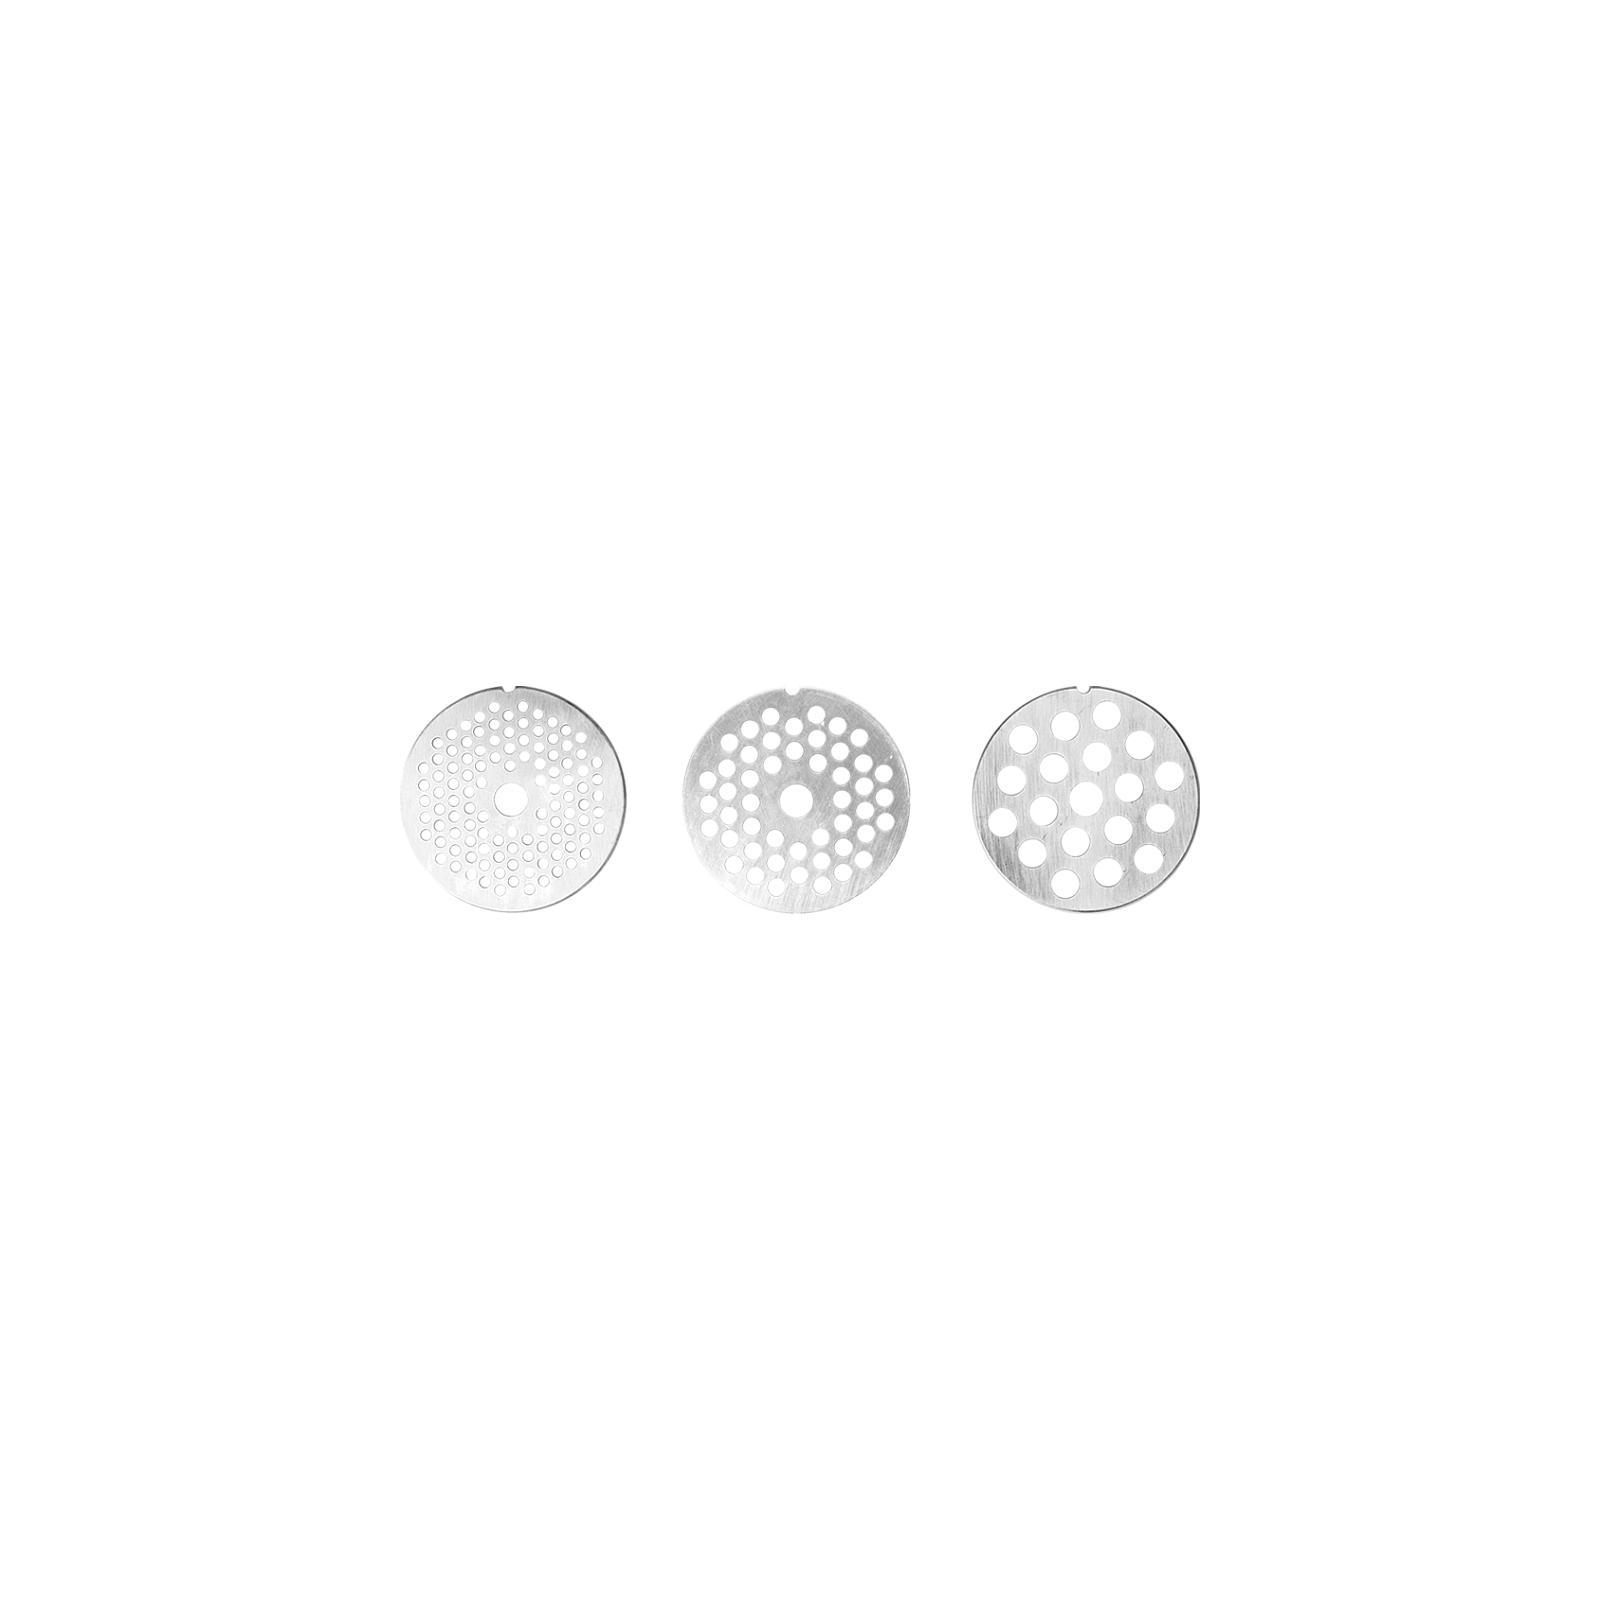 Мясорубка REDMOND RMG-1205-8 White изображение 4